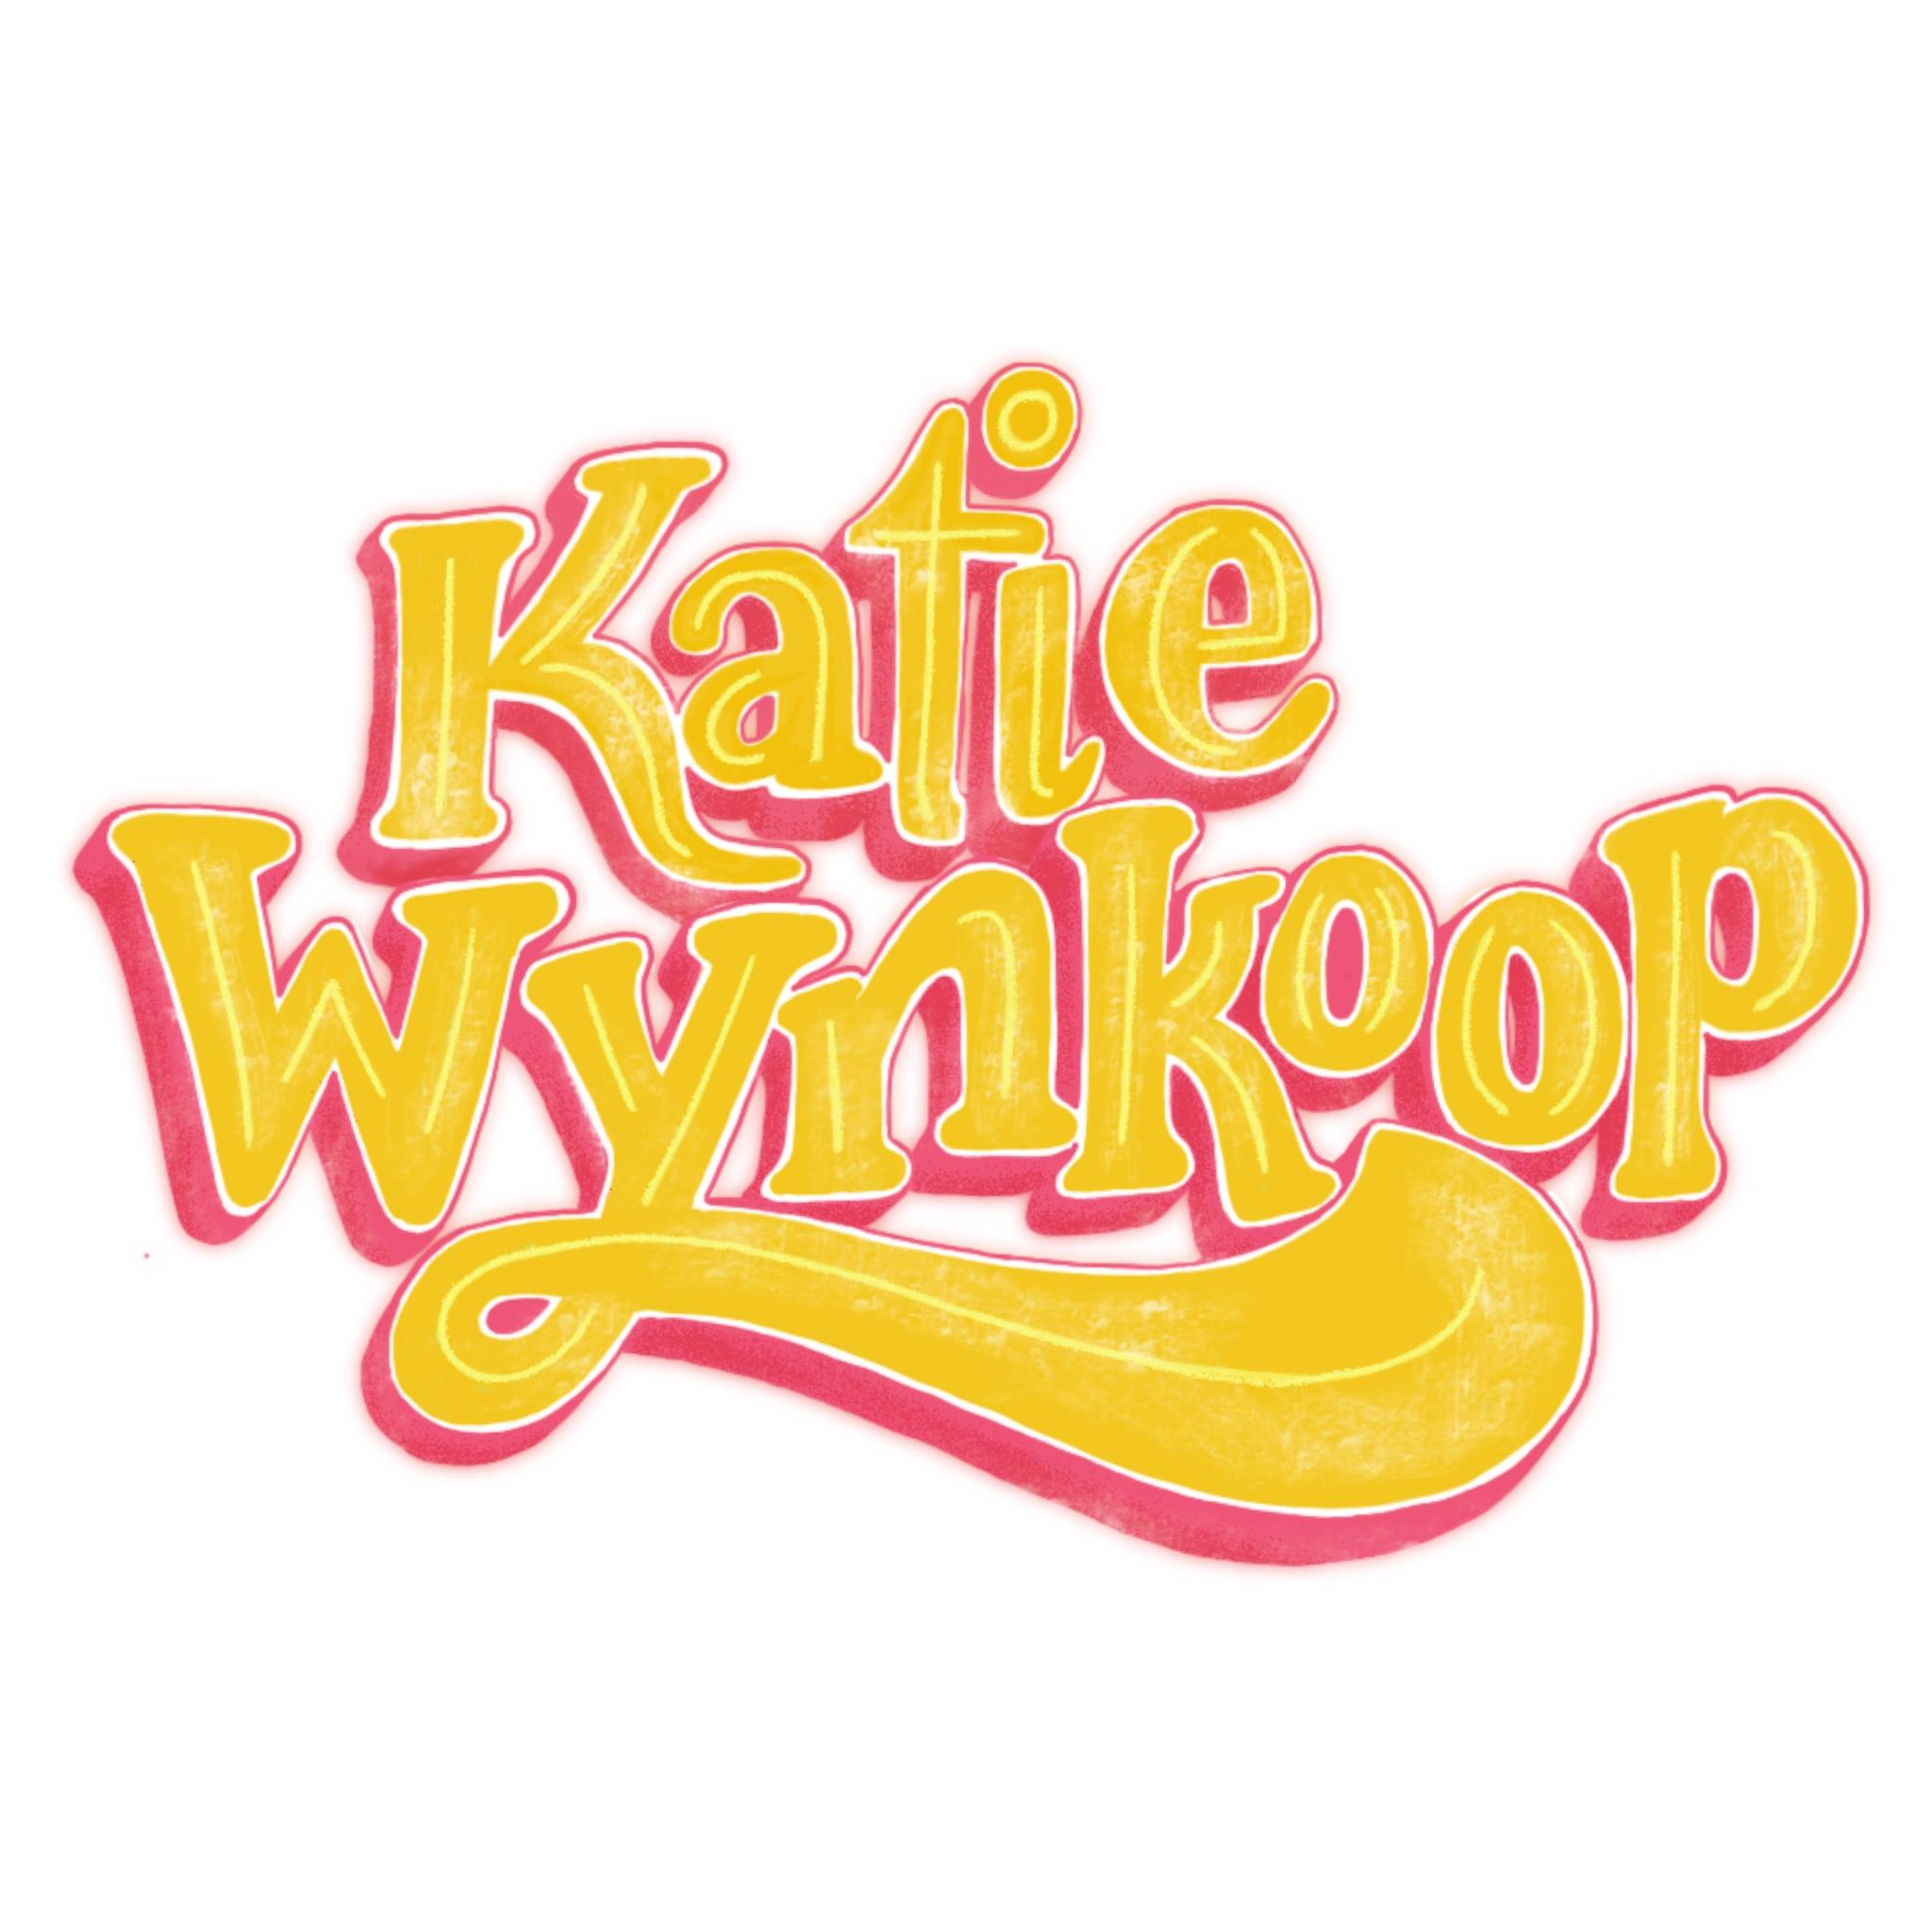 Katie Wynkoop